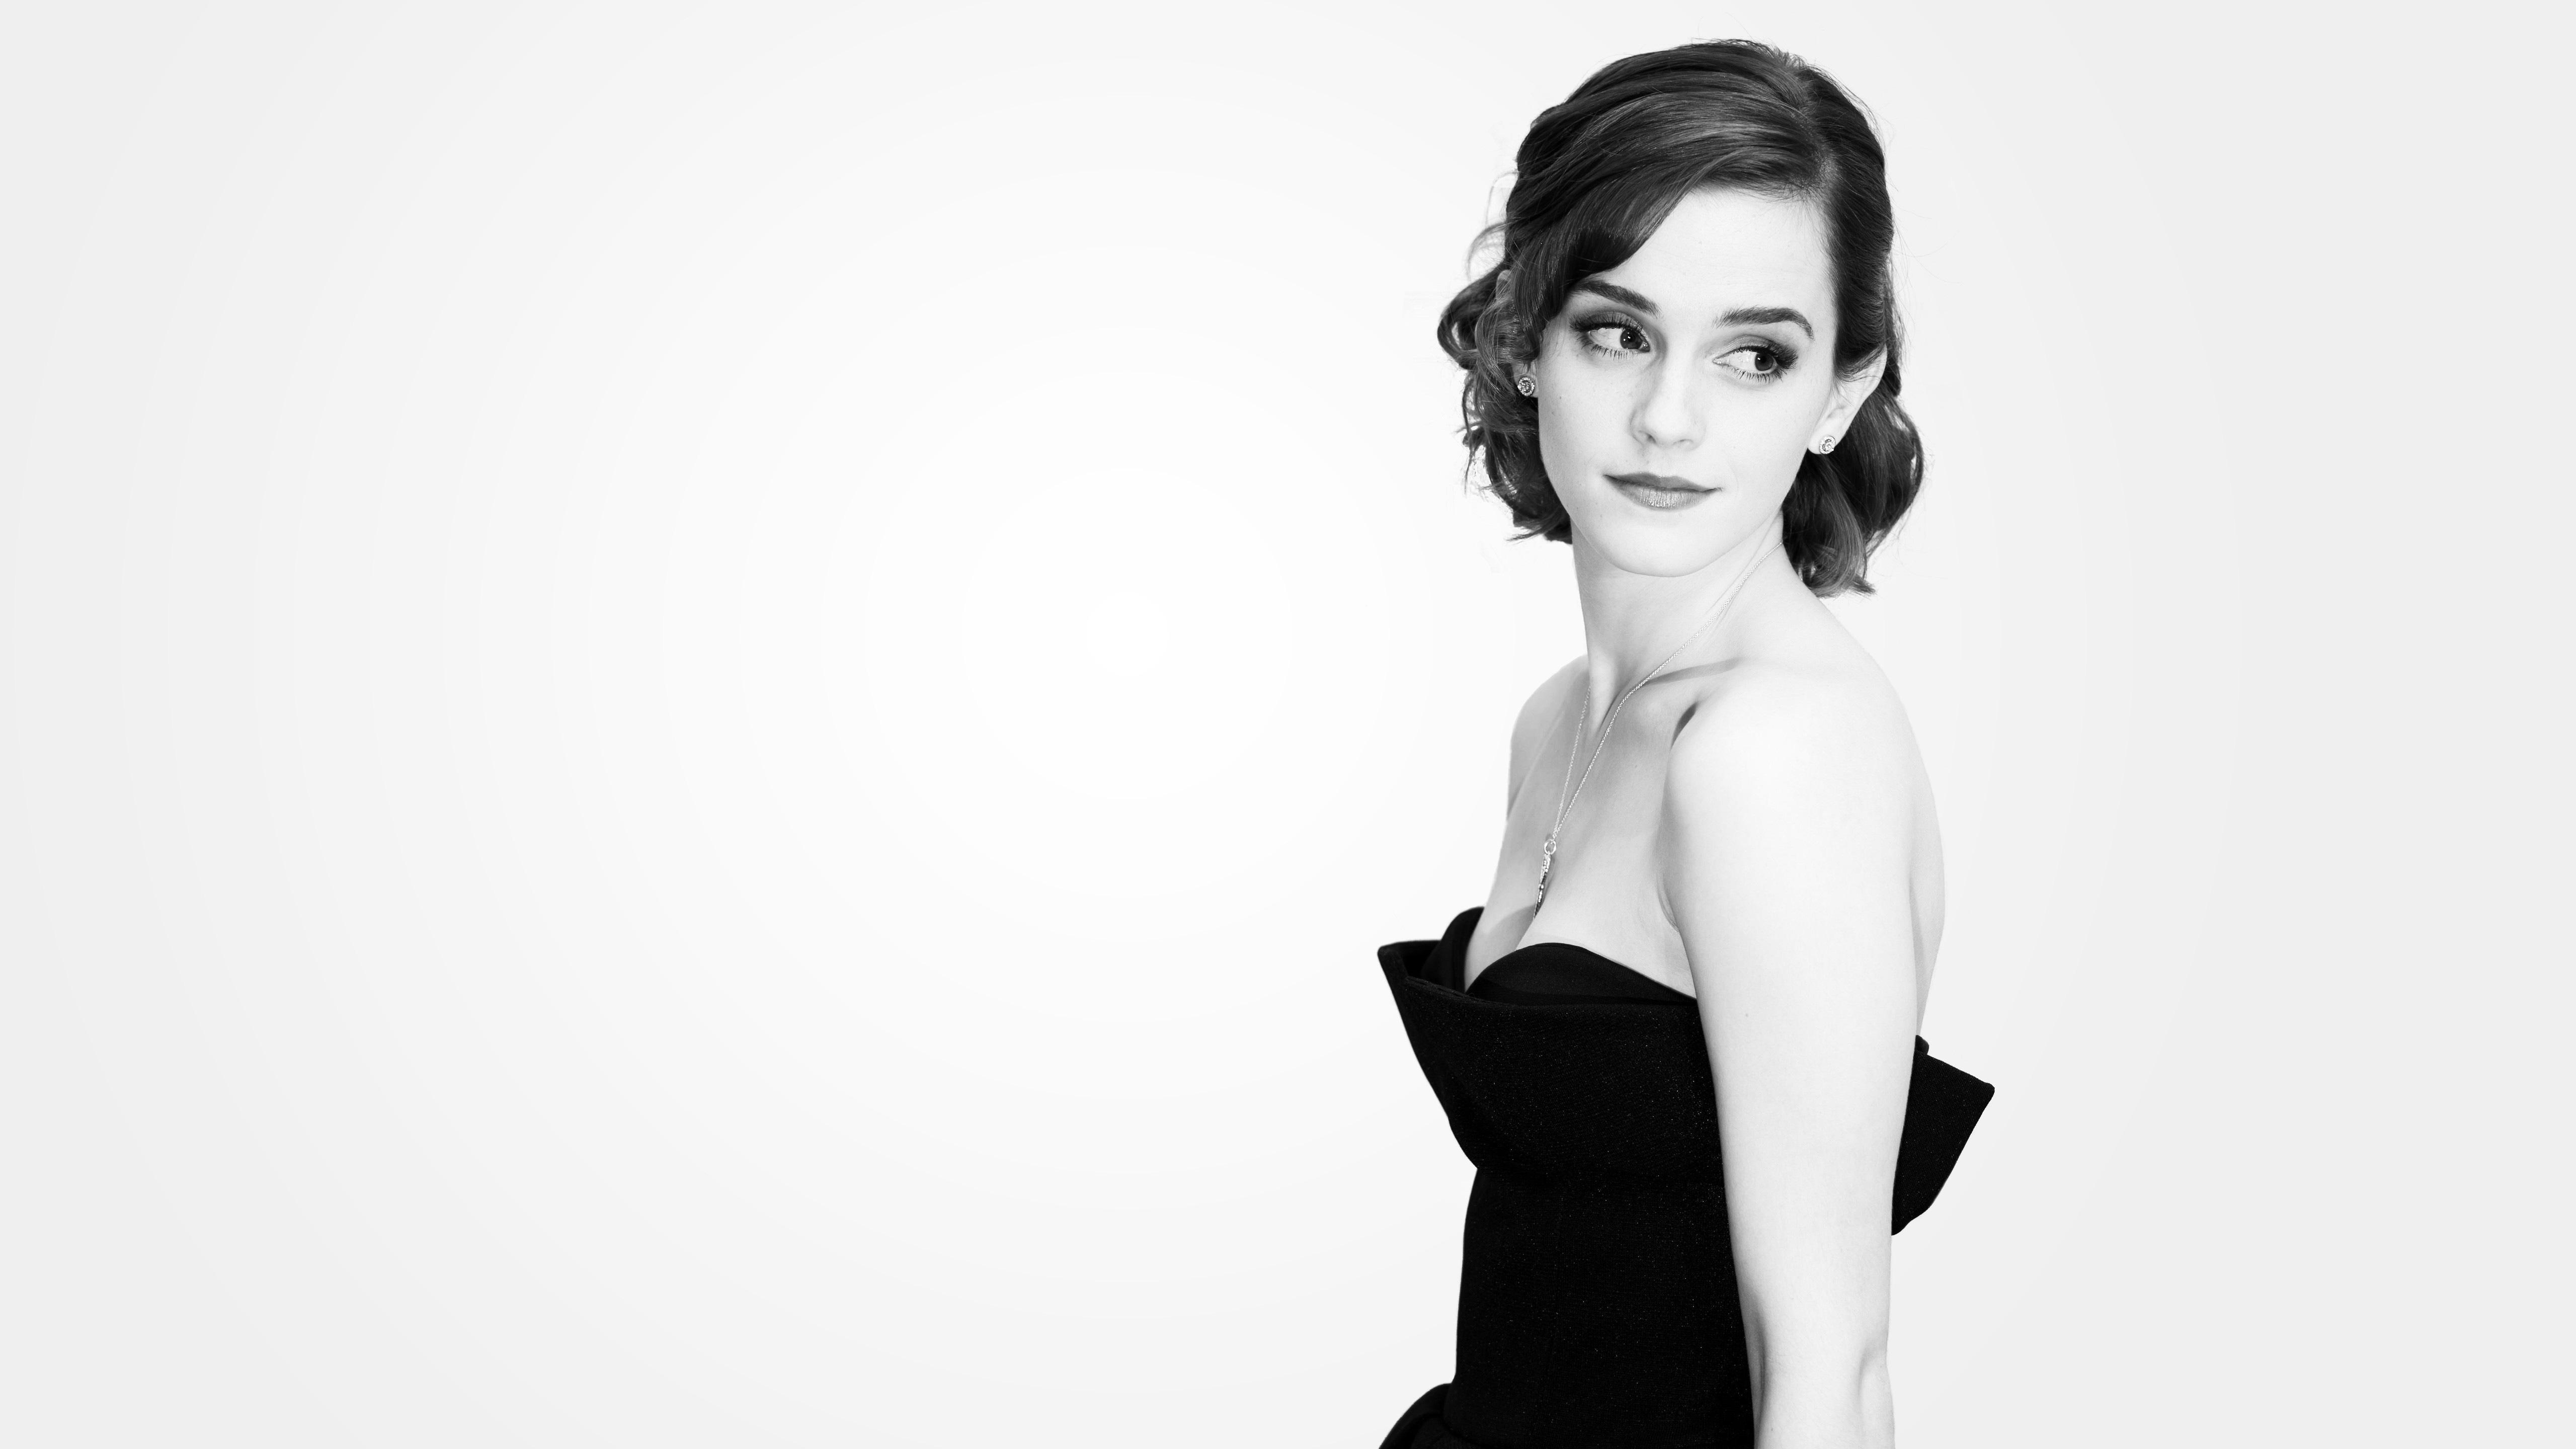 Emma Watson Wallpapers | Celebrities HD Wallpapers - Page 1